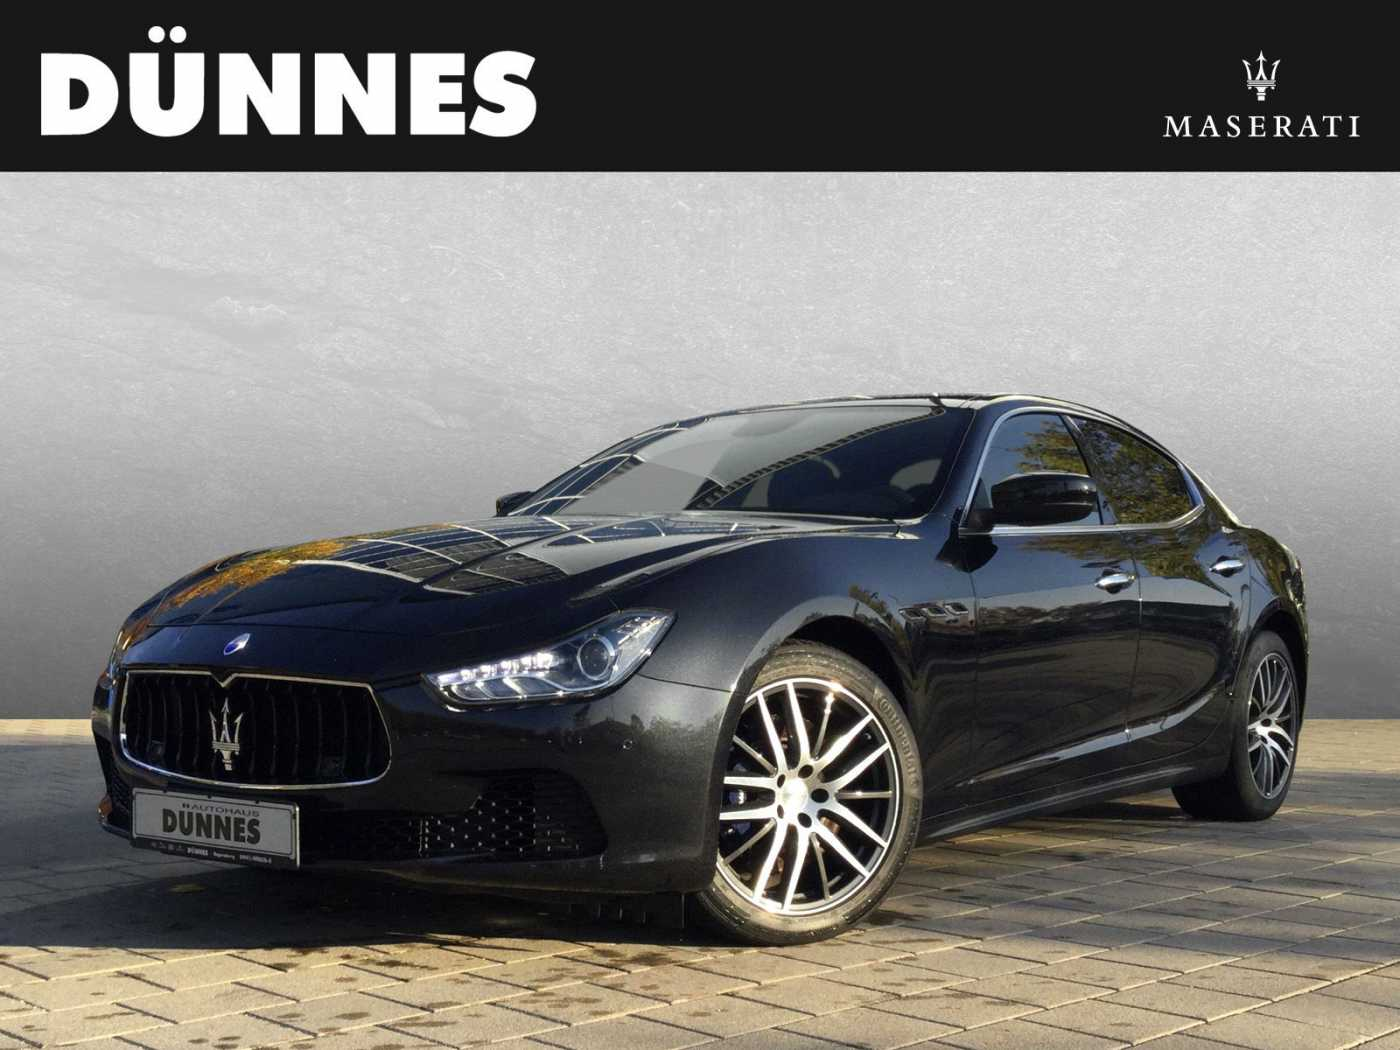 Maserati Ghibli Diesel Automatik - Business Plus, Toter Winkel, 19', uvm. - Maserati Regensburg, Jahr 2016, Diesel